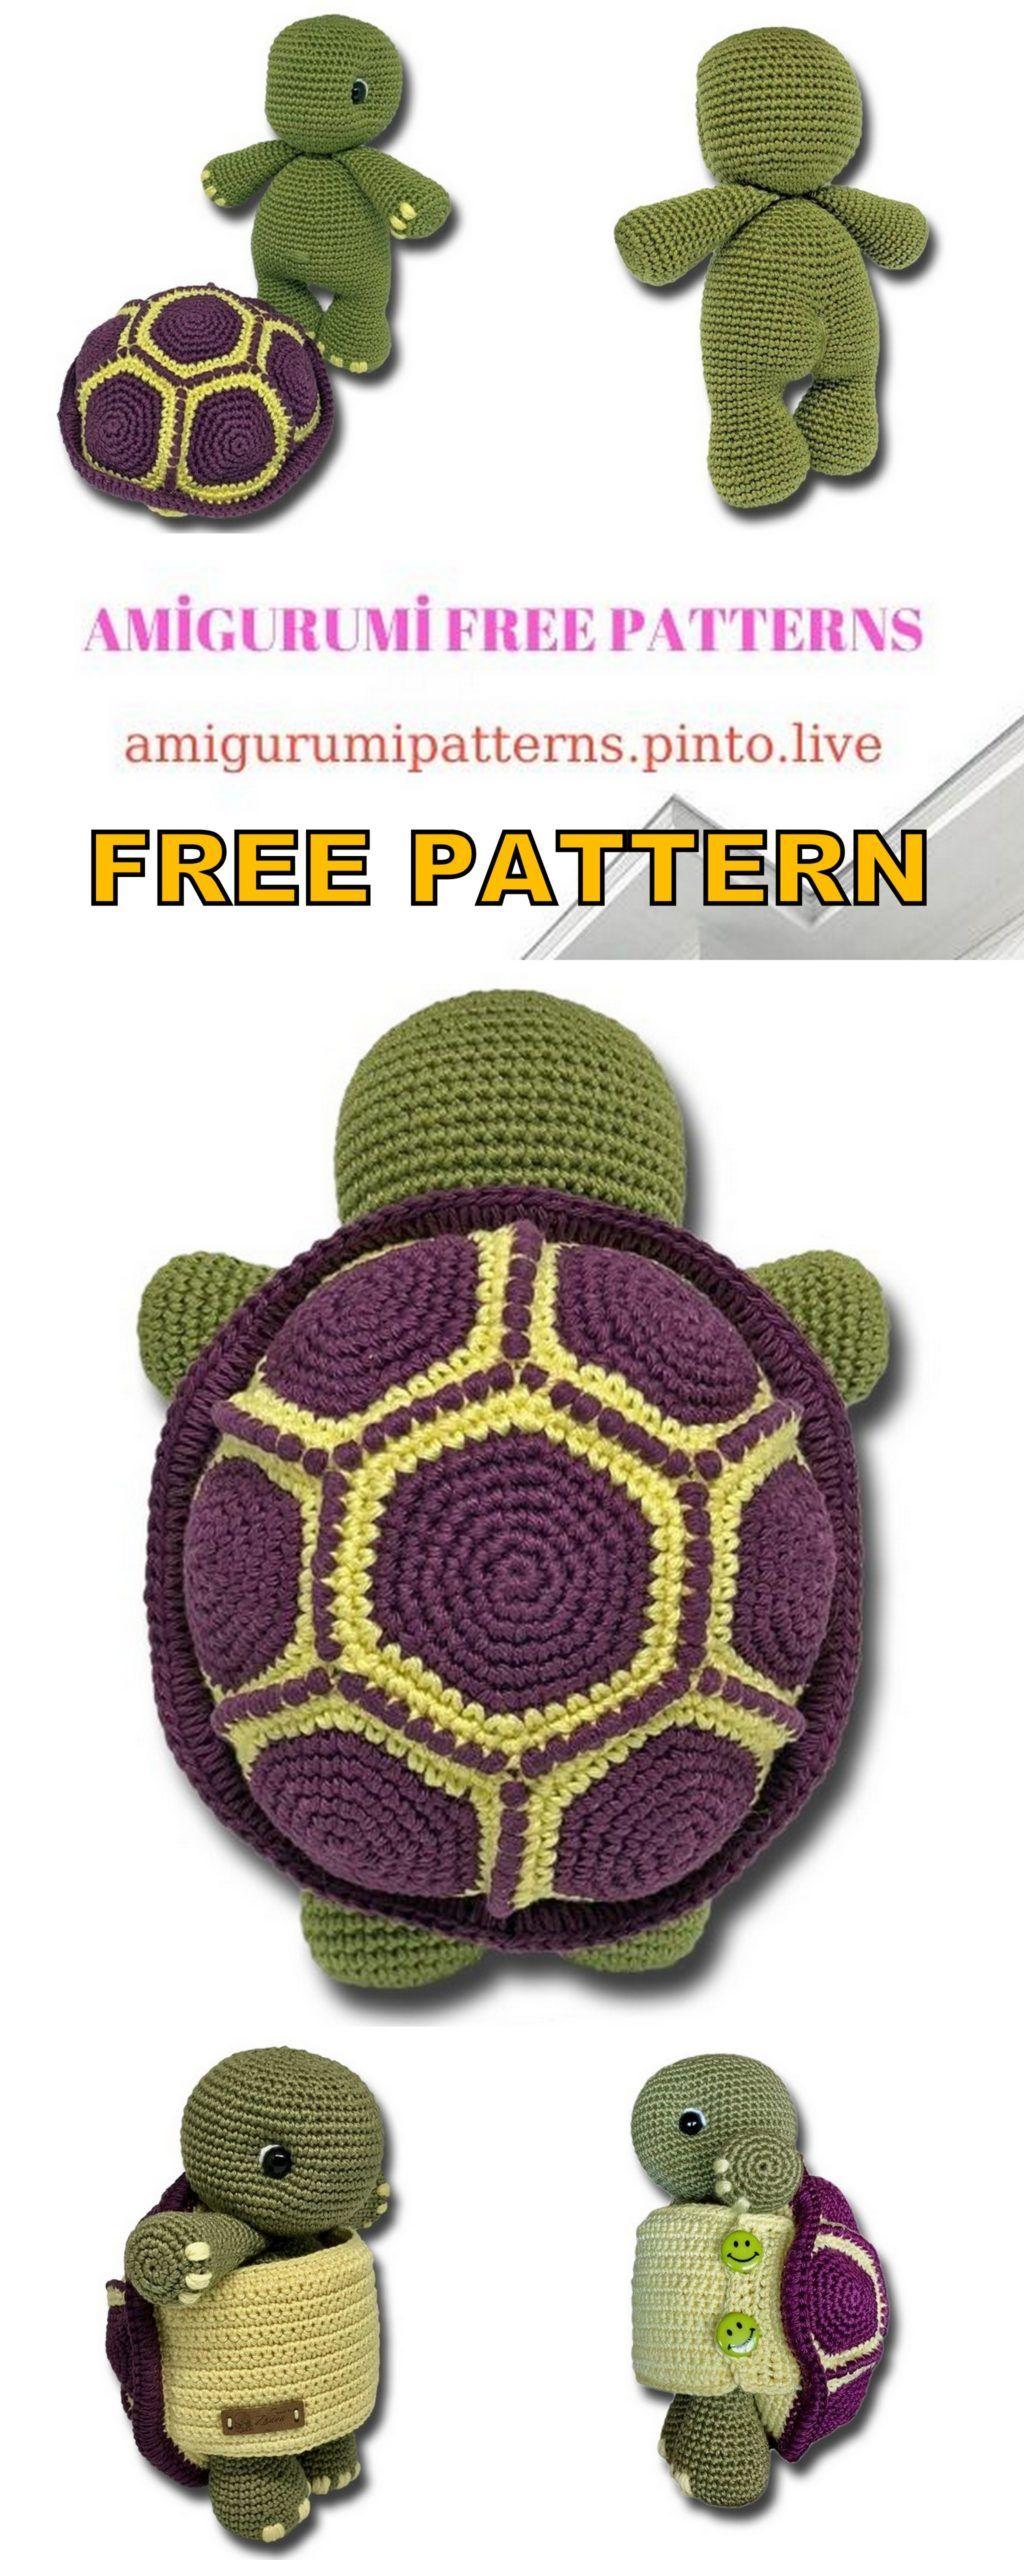 Amigurumi Turtle Free Crochet Pattern – Amigurumi Free Patterns